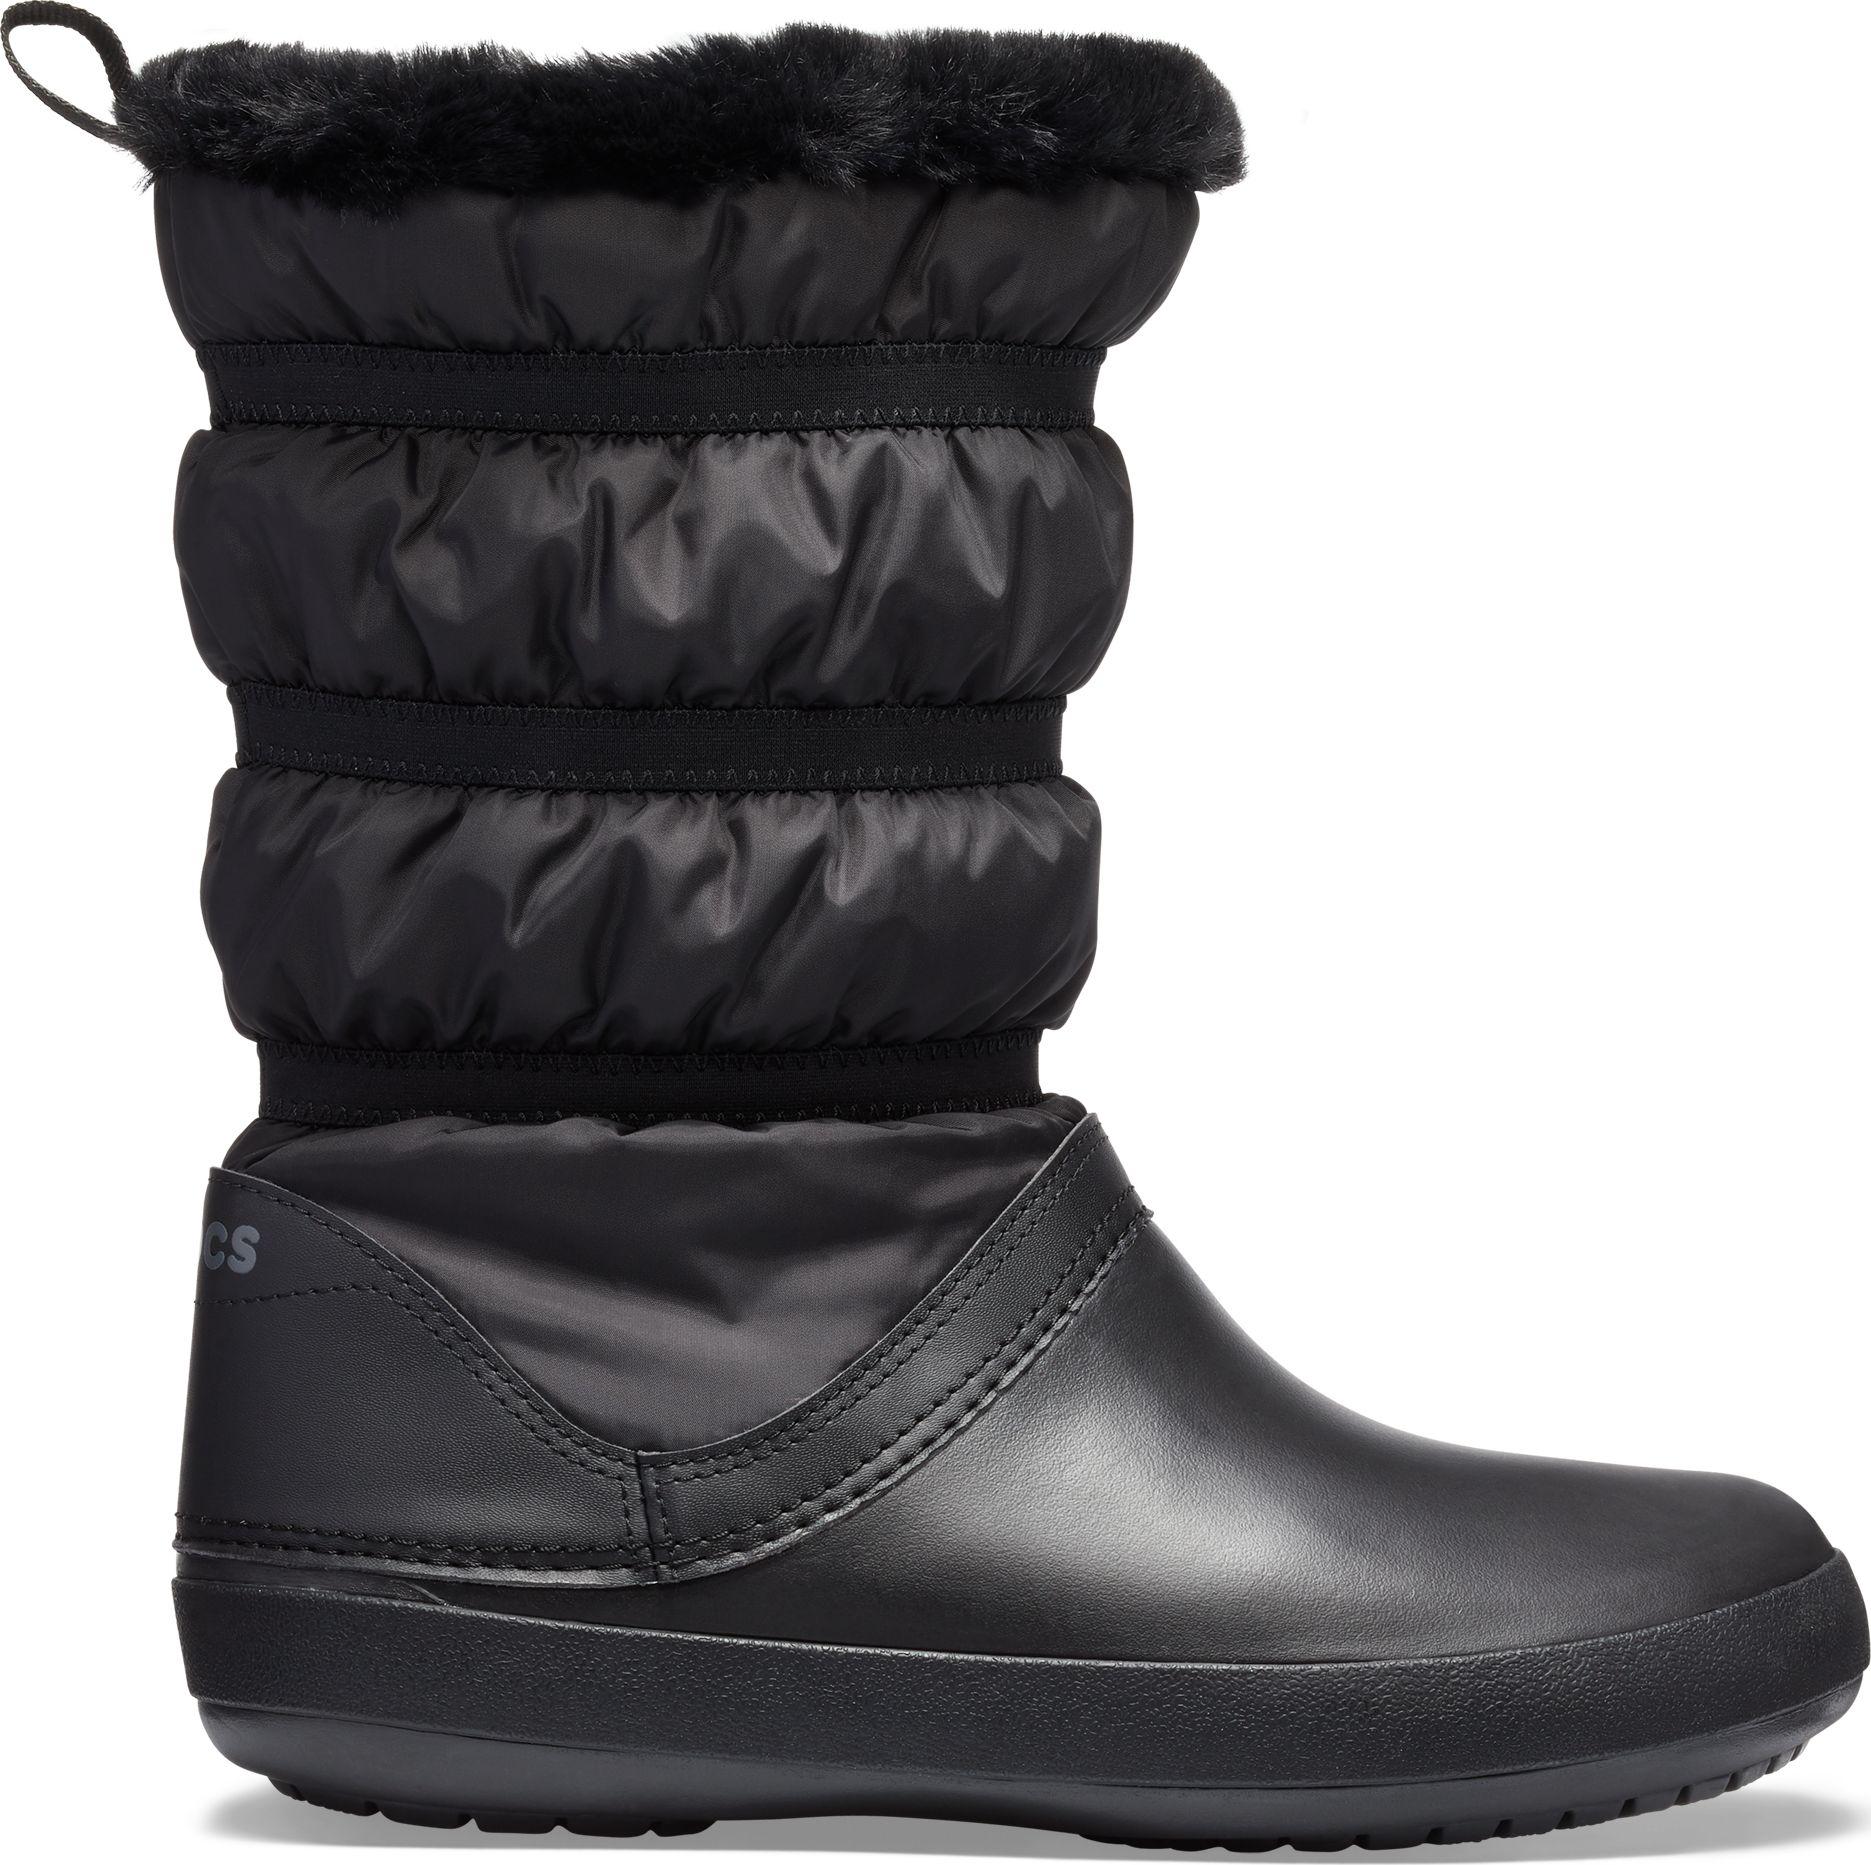 Crocs™ Women's Crocband Winter Boot Black/Black 41